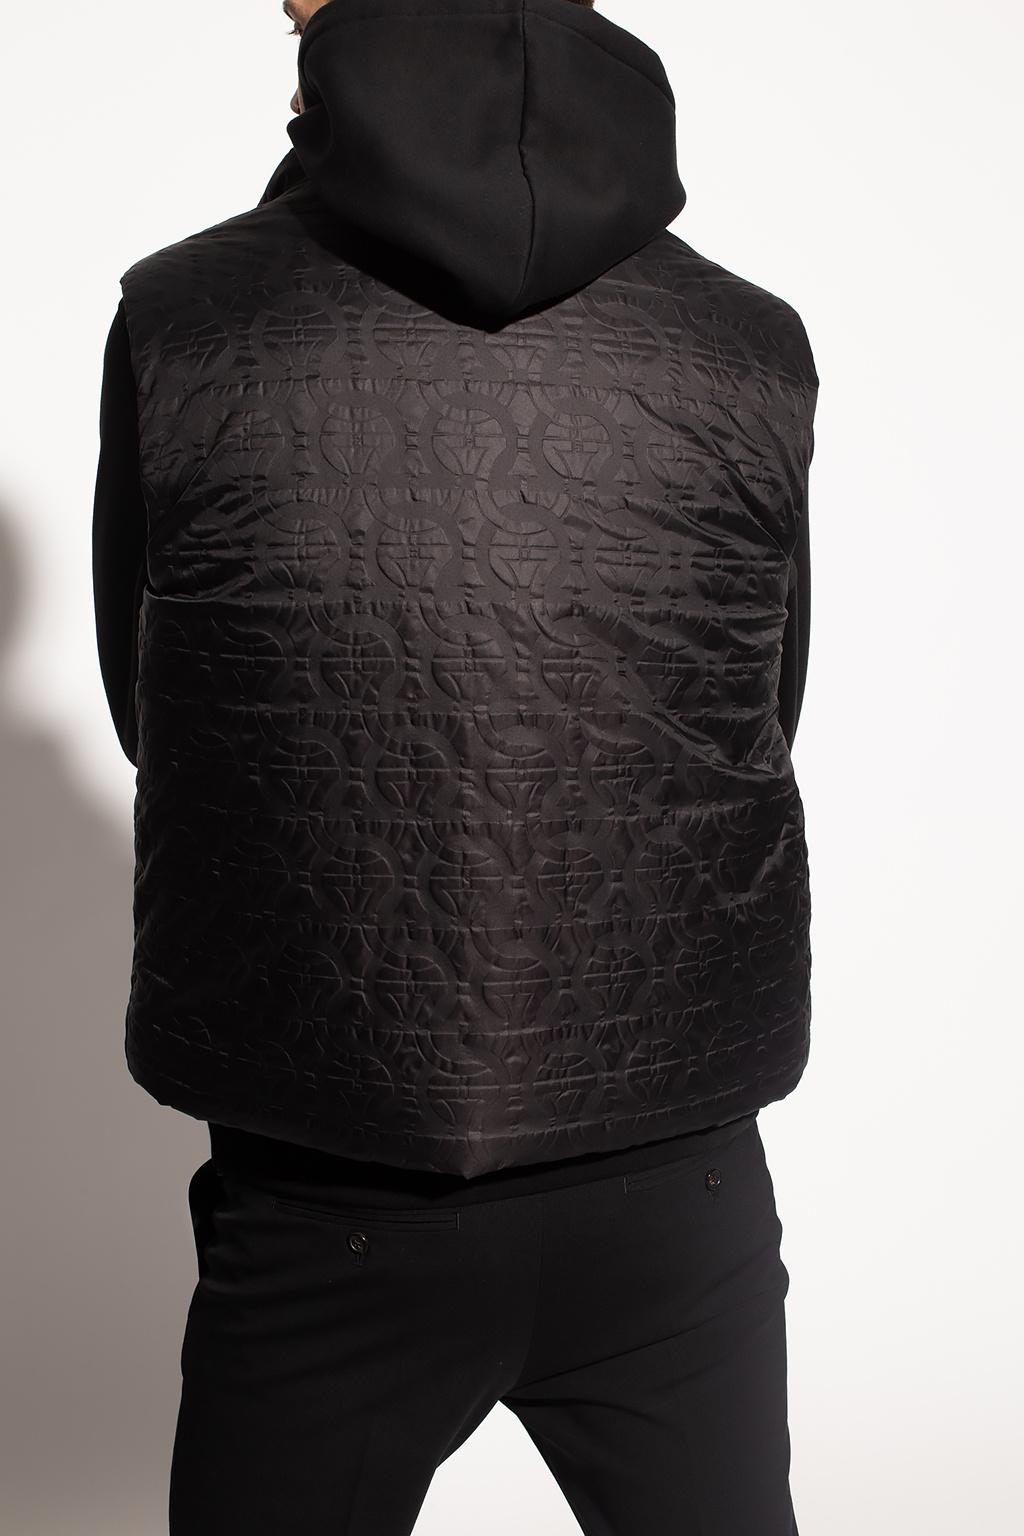 Salvatore Ferragamo Vest with logo